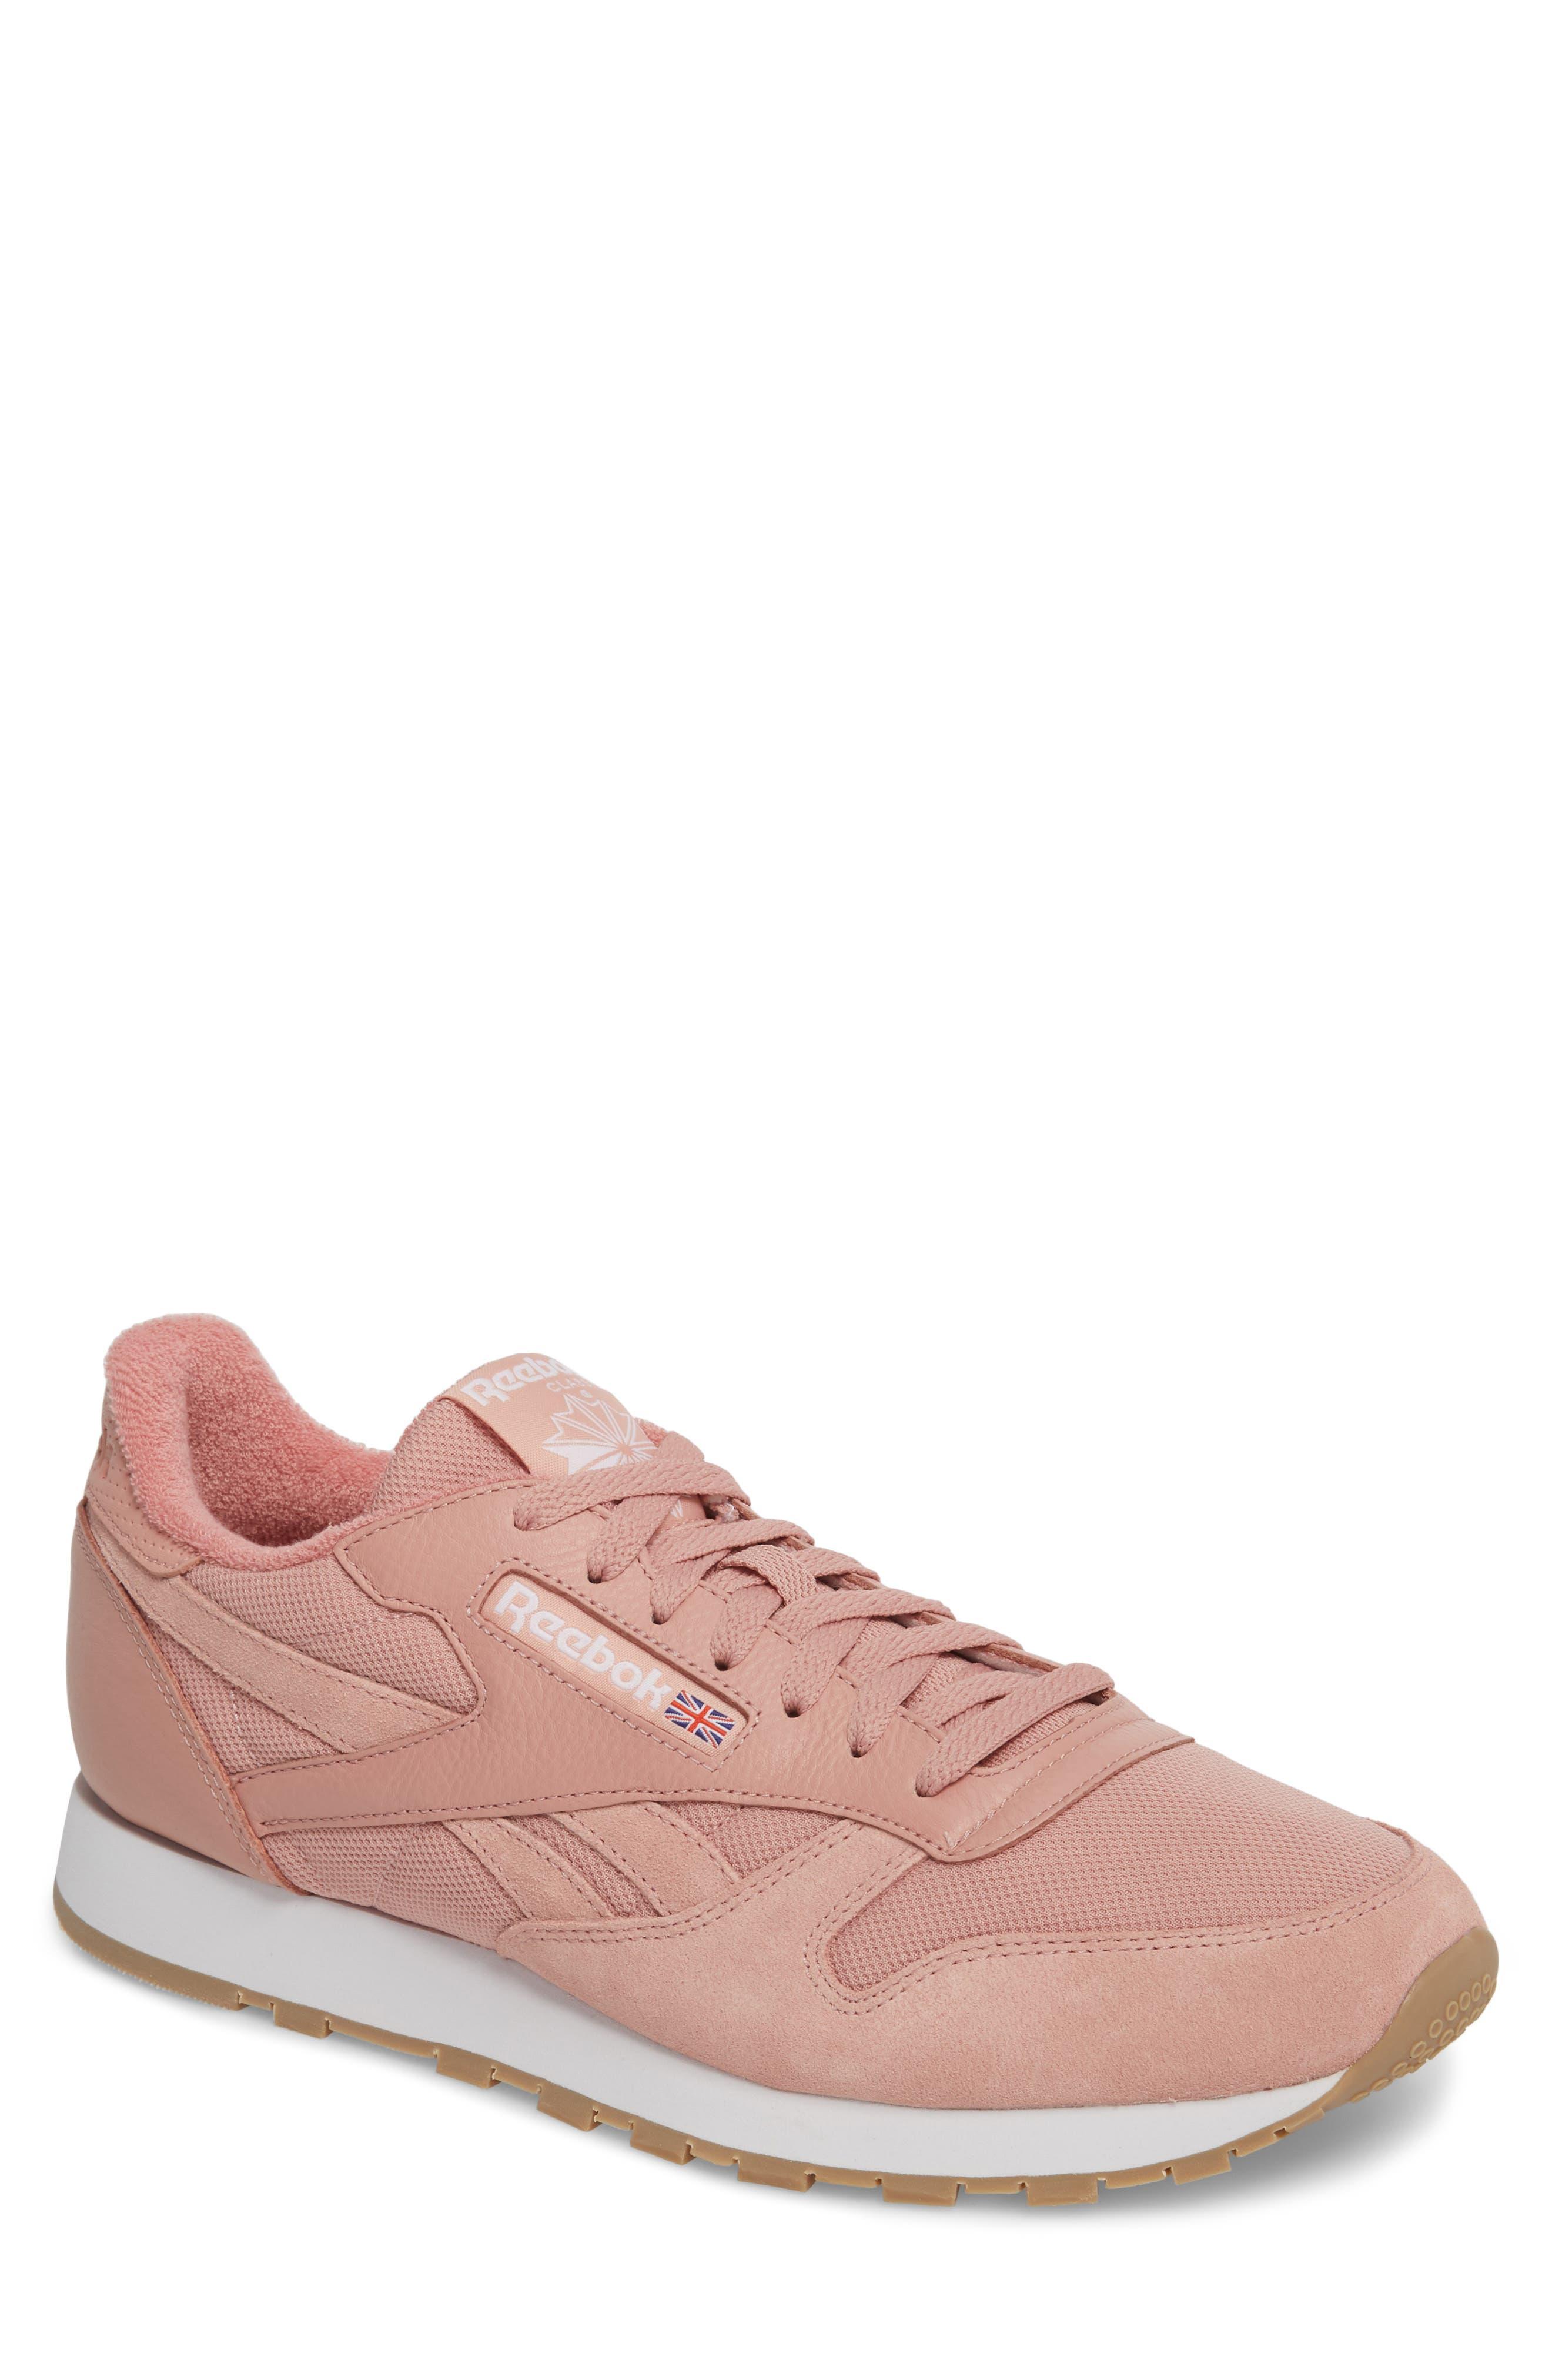 Reebok ESTL Classic Leather Sneaker (Men)